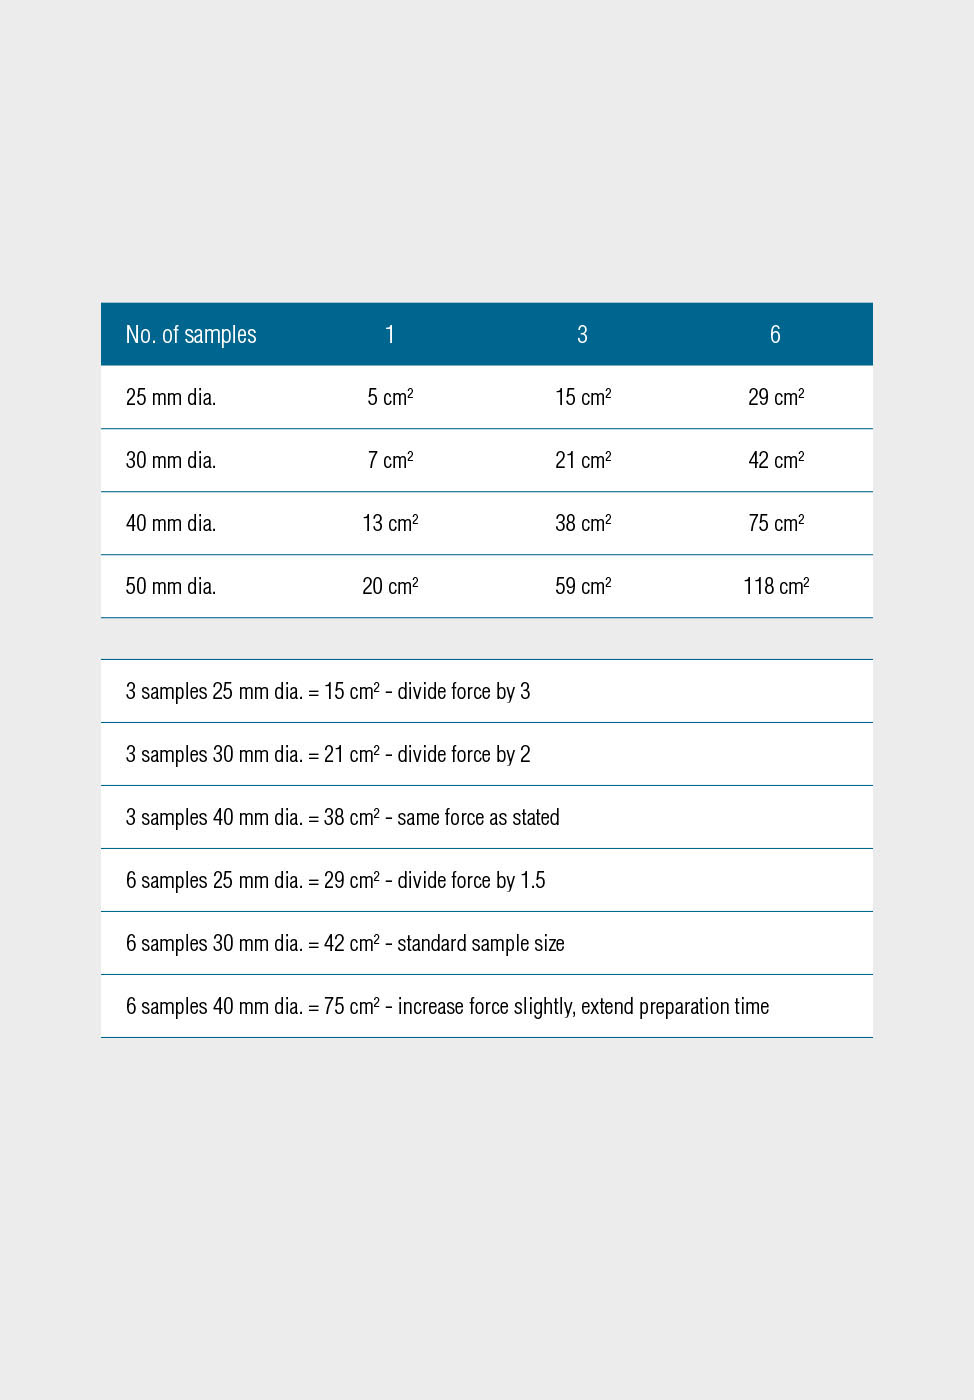 Grinding and polishing preparation parameters